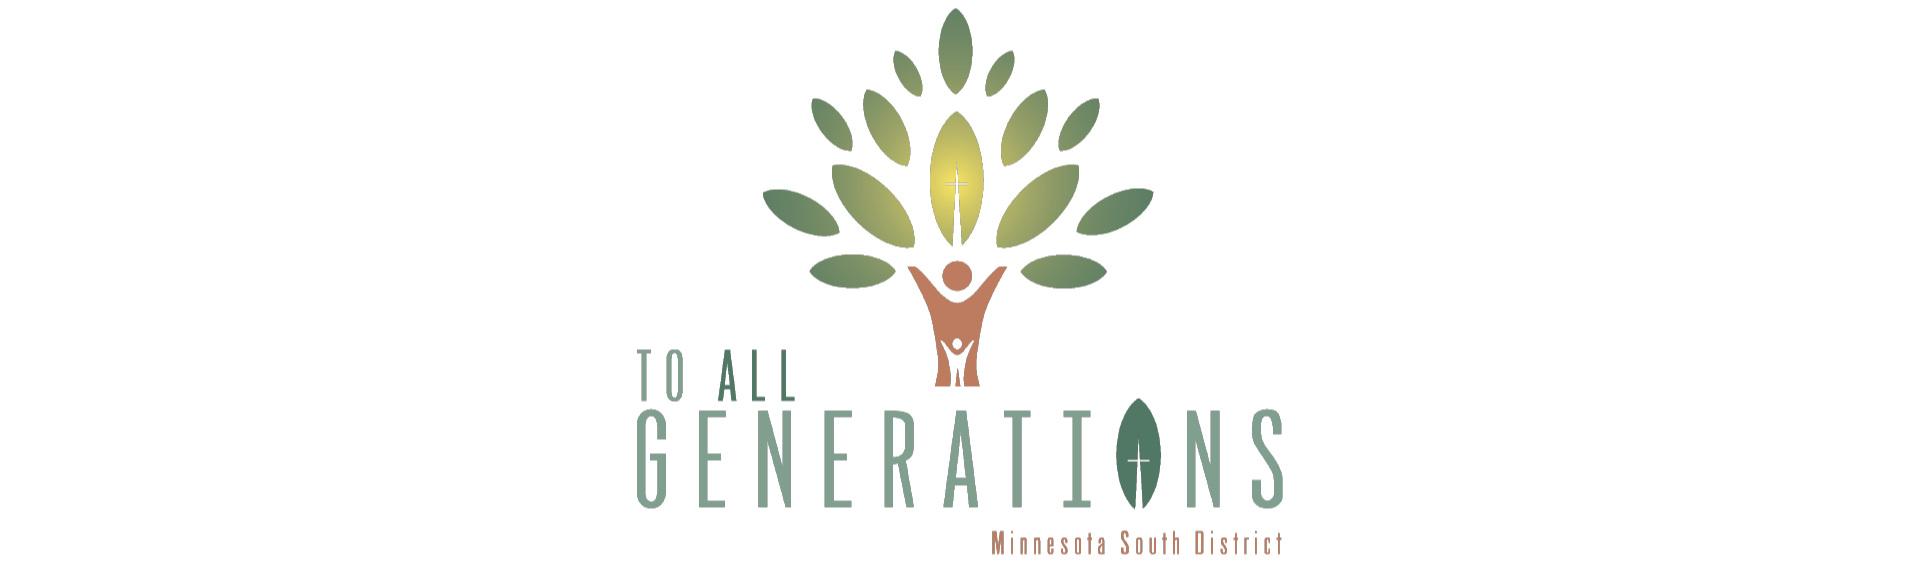 To_All-Generations_Final+for+website+header-01.jpg